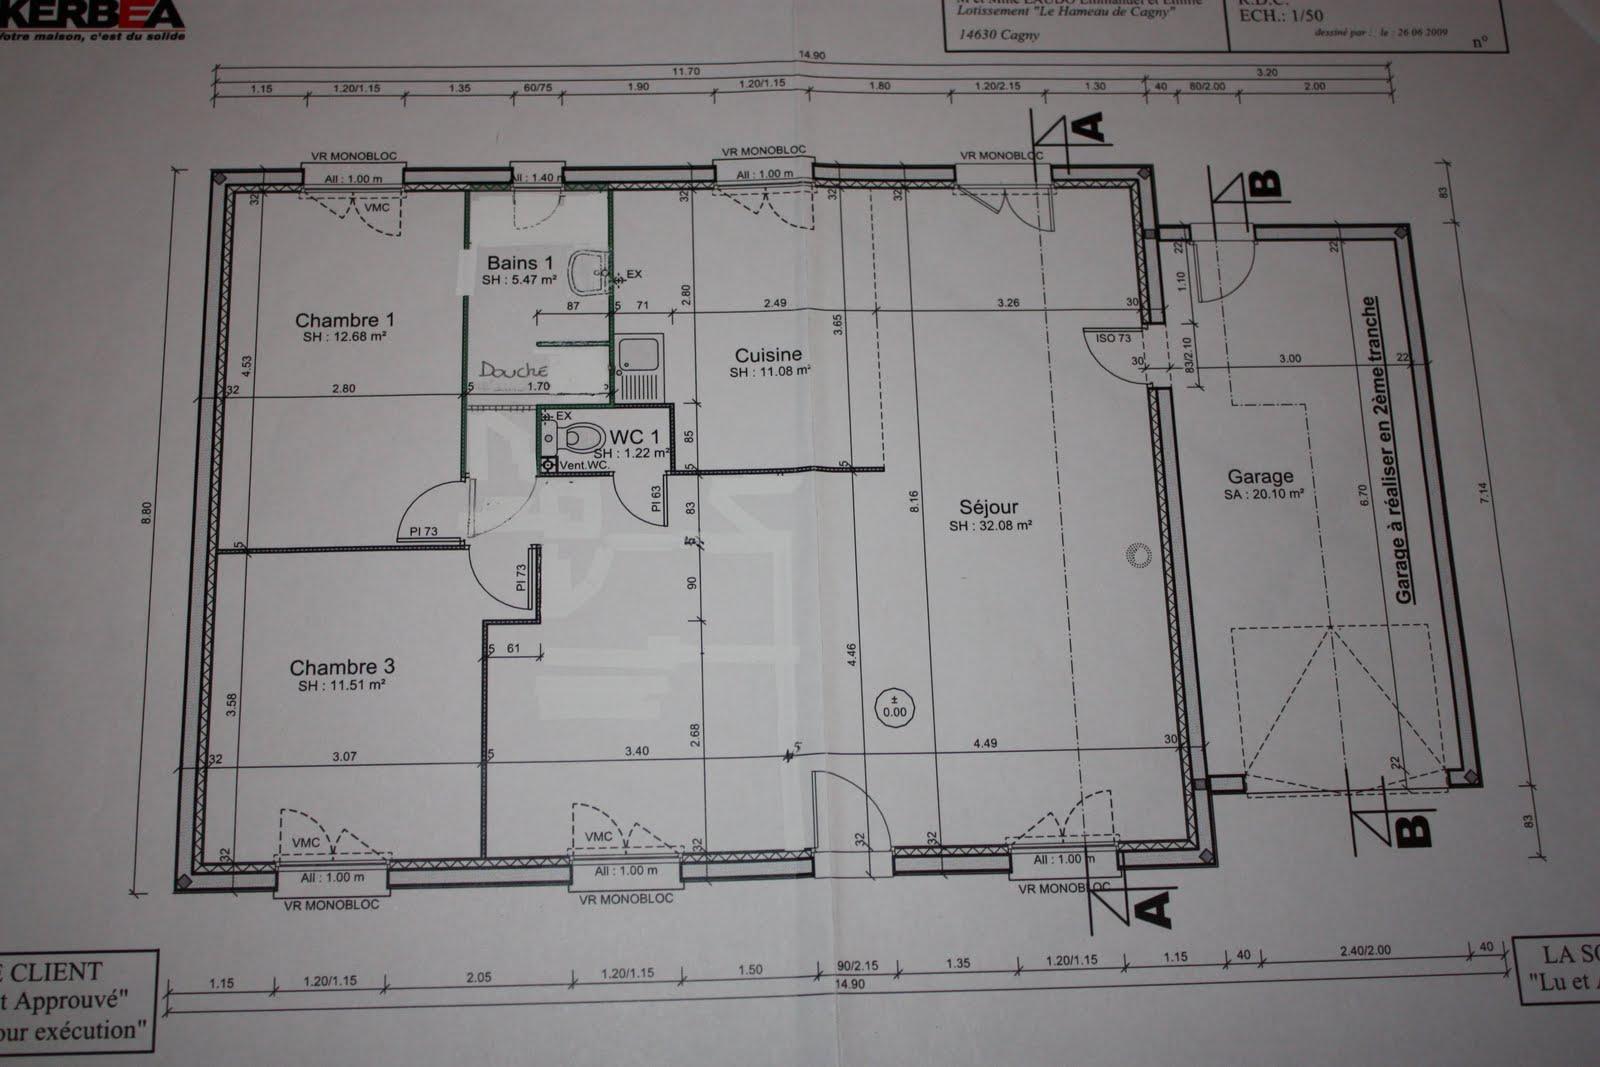 Plan de maison kerbea for Construire maison kerbea